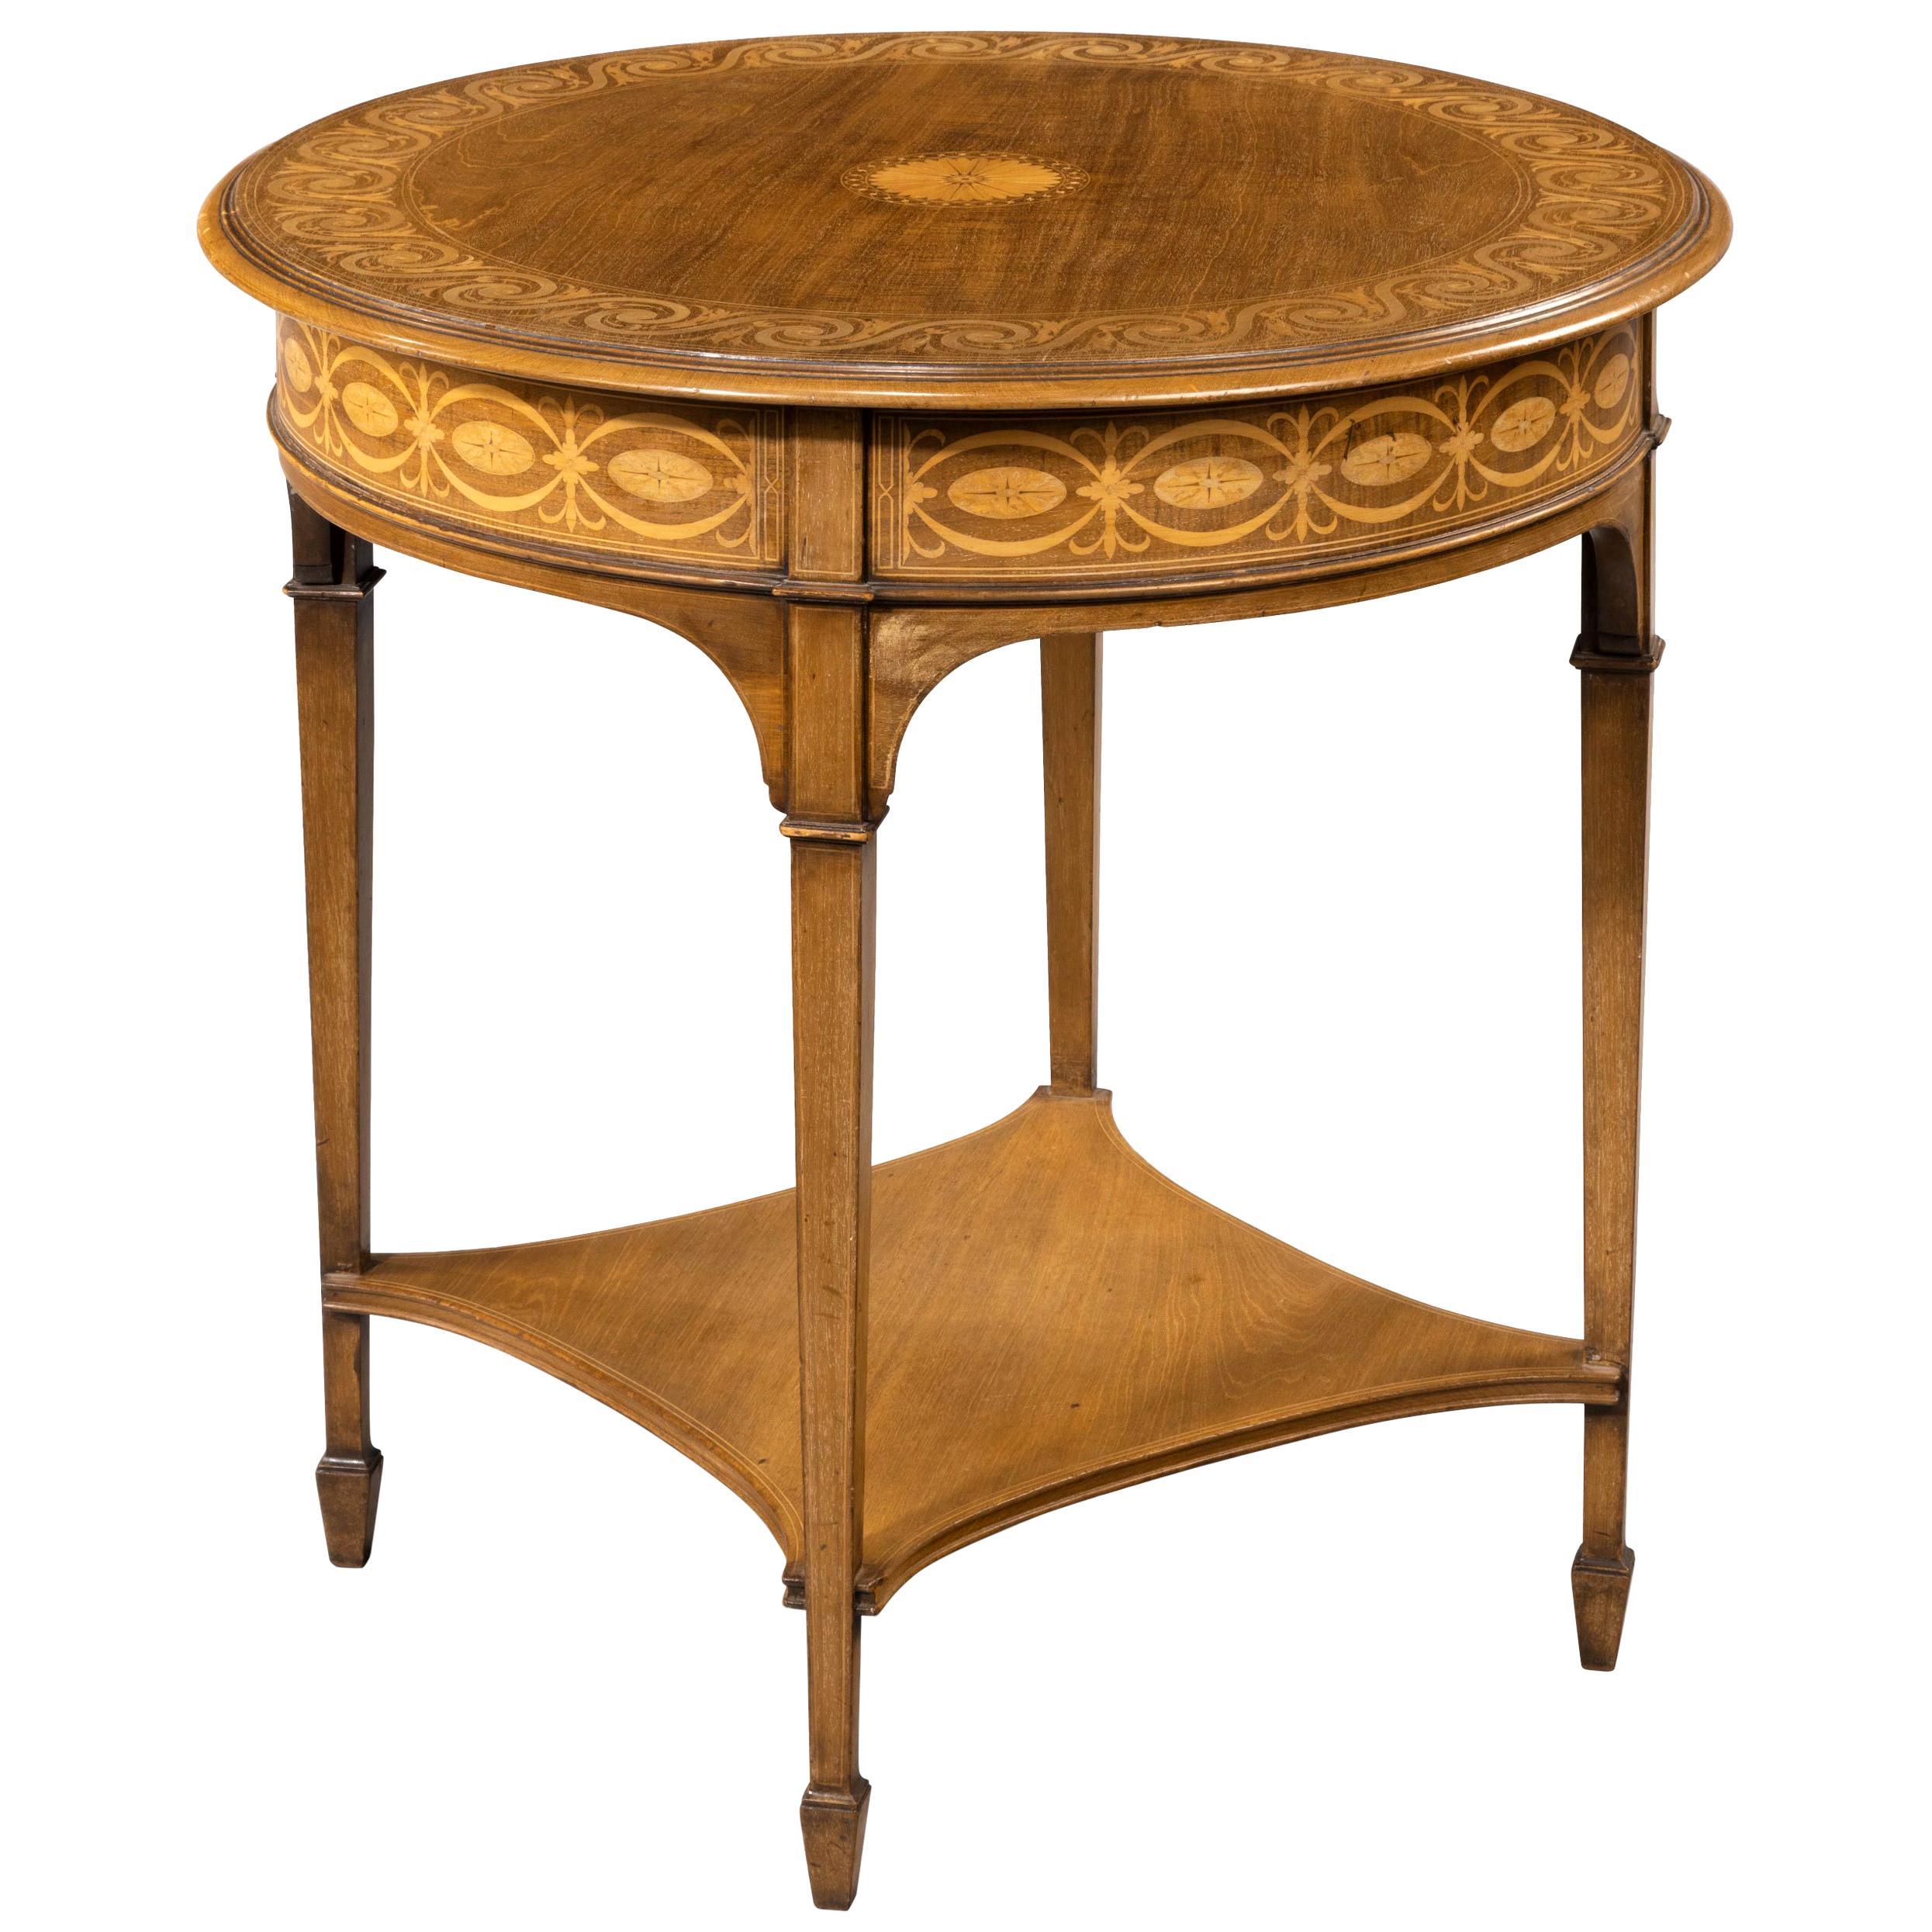 Very Fine Quality Early 20th Century Mahogany Centre Table